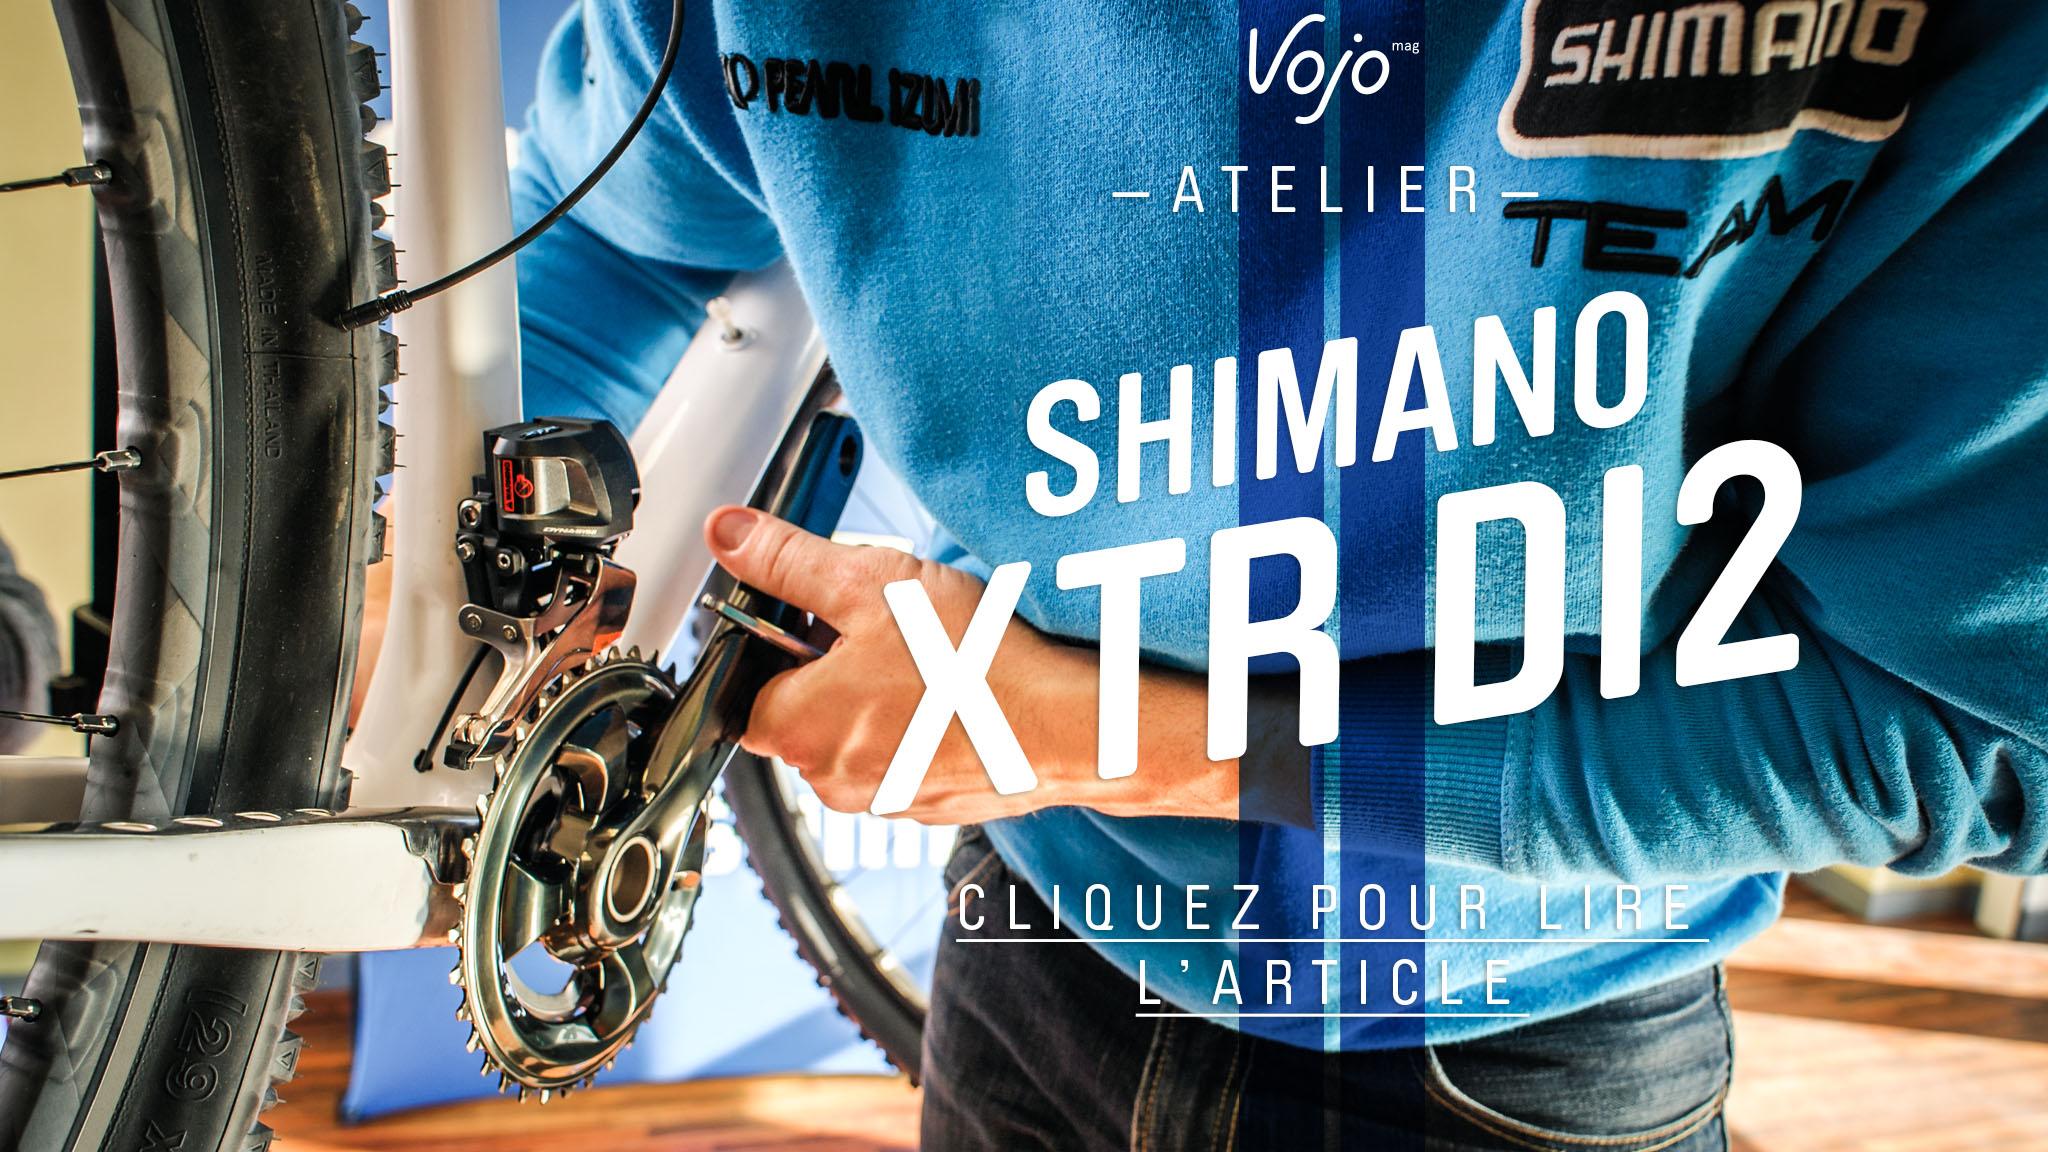 Shimano_XTR_Di2_Atelier_Annonce_Cliquez_Copyright_OBeart_VojoMag-1